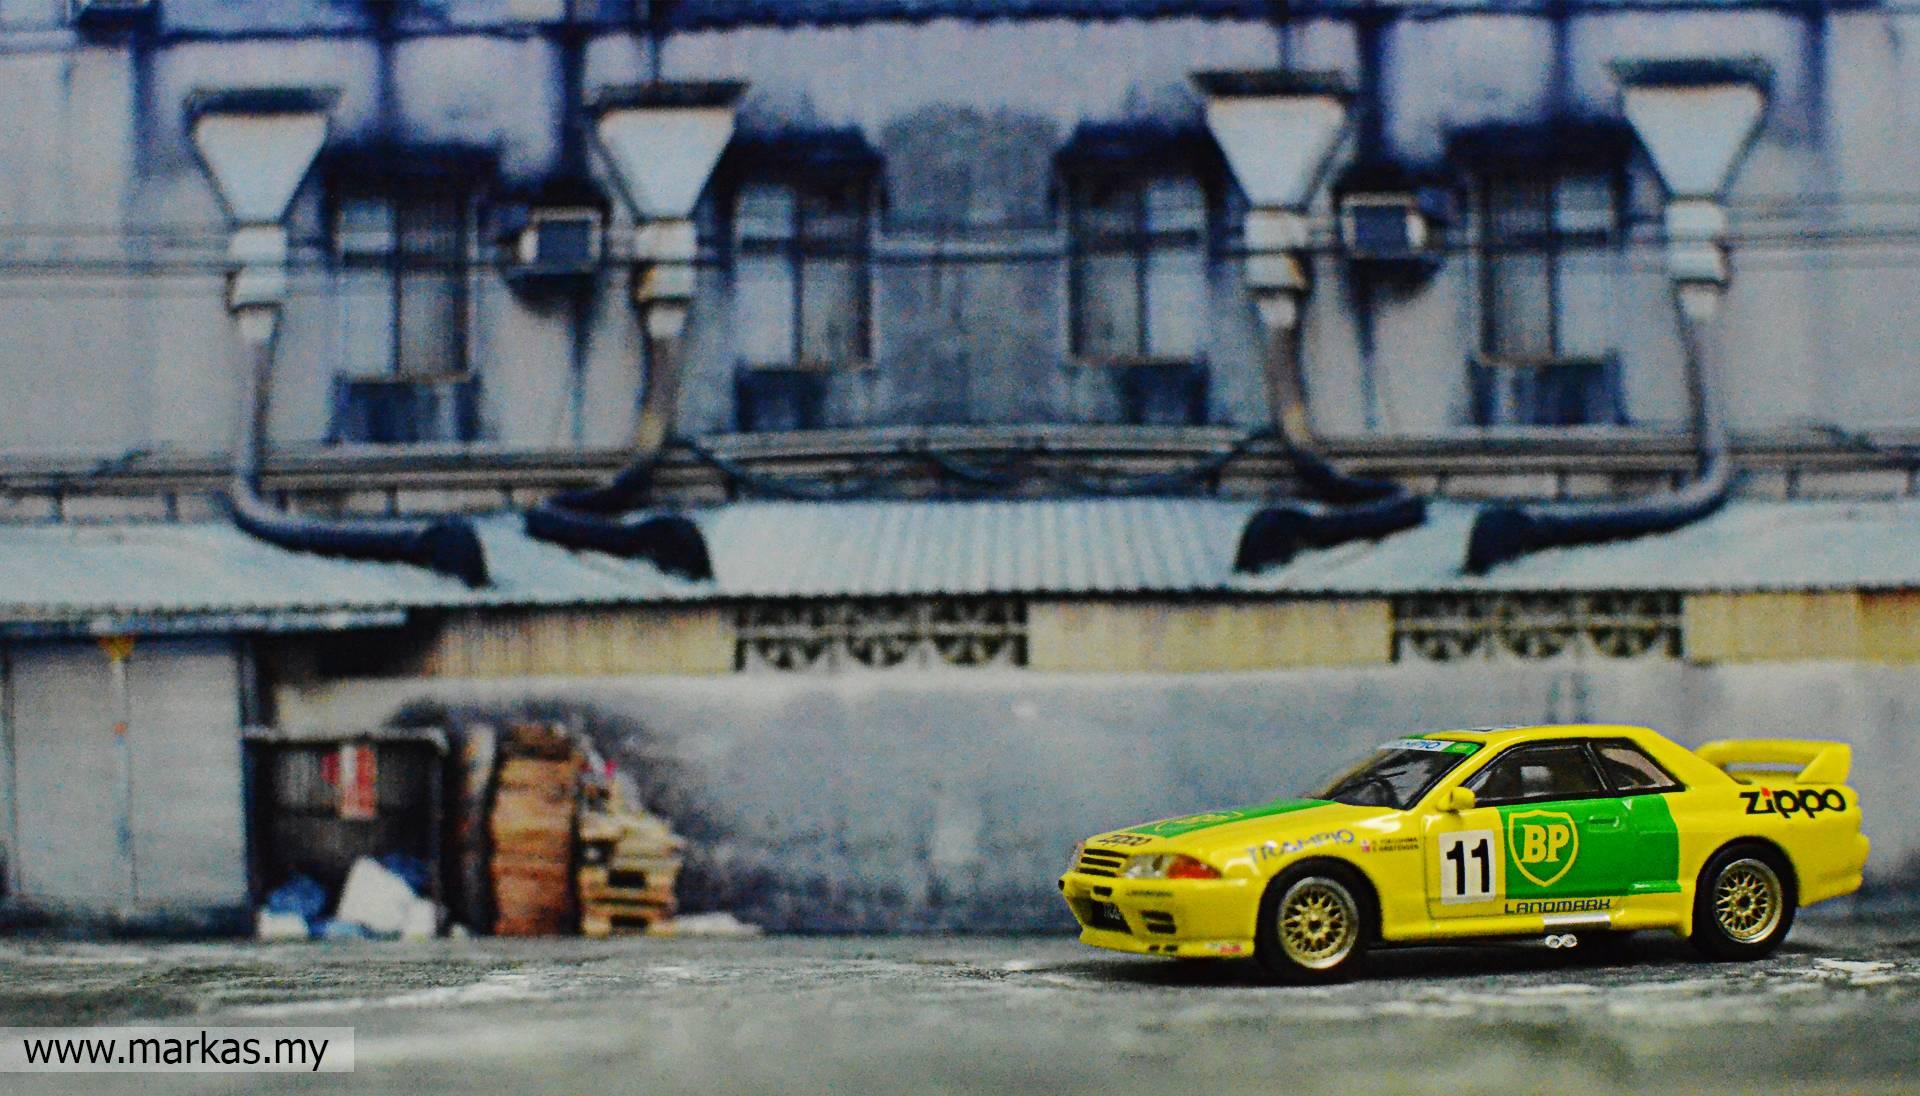 MINI GT 1/64 #178 NISSAN SKYLINE GT-R R32 GR.A #11 BP 1993 JAPAN TOURING CAR CHAMPIONSHIP